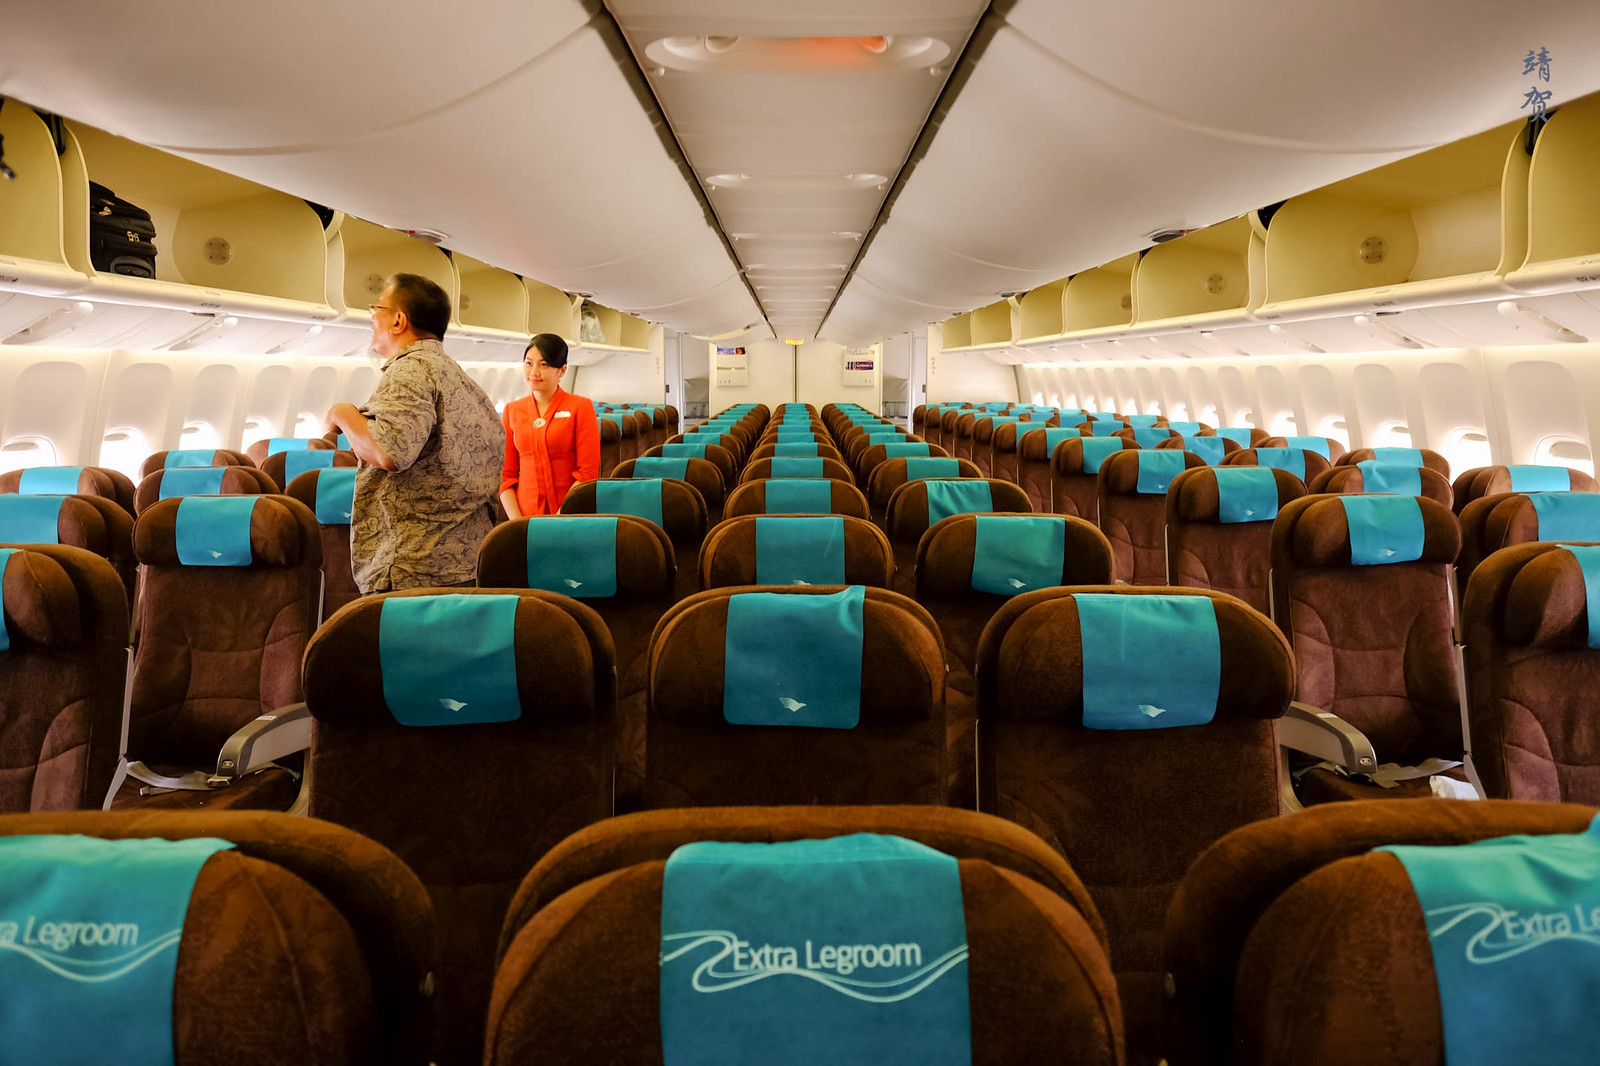 Rear Economy Class cabin